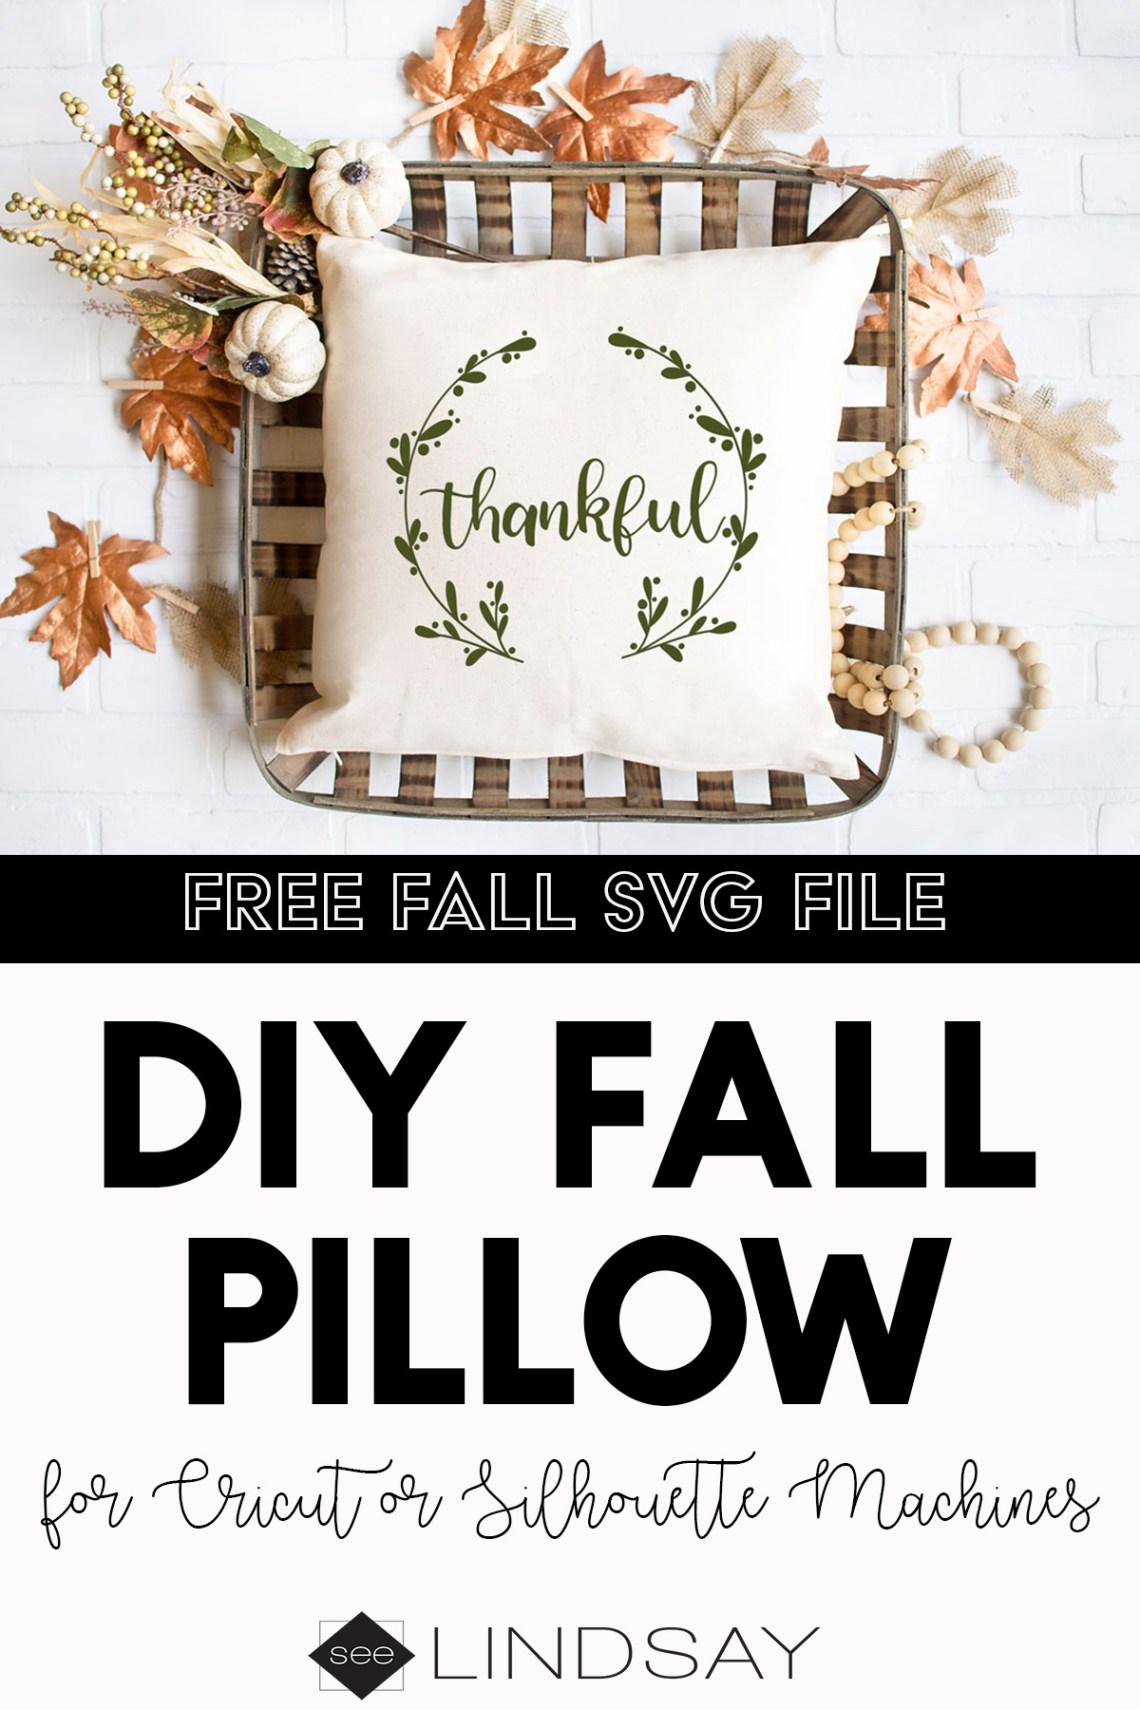 Download FREE Thanksgiving SVG file | DIY Fall pillow ideas ...